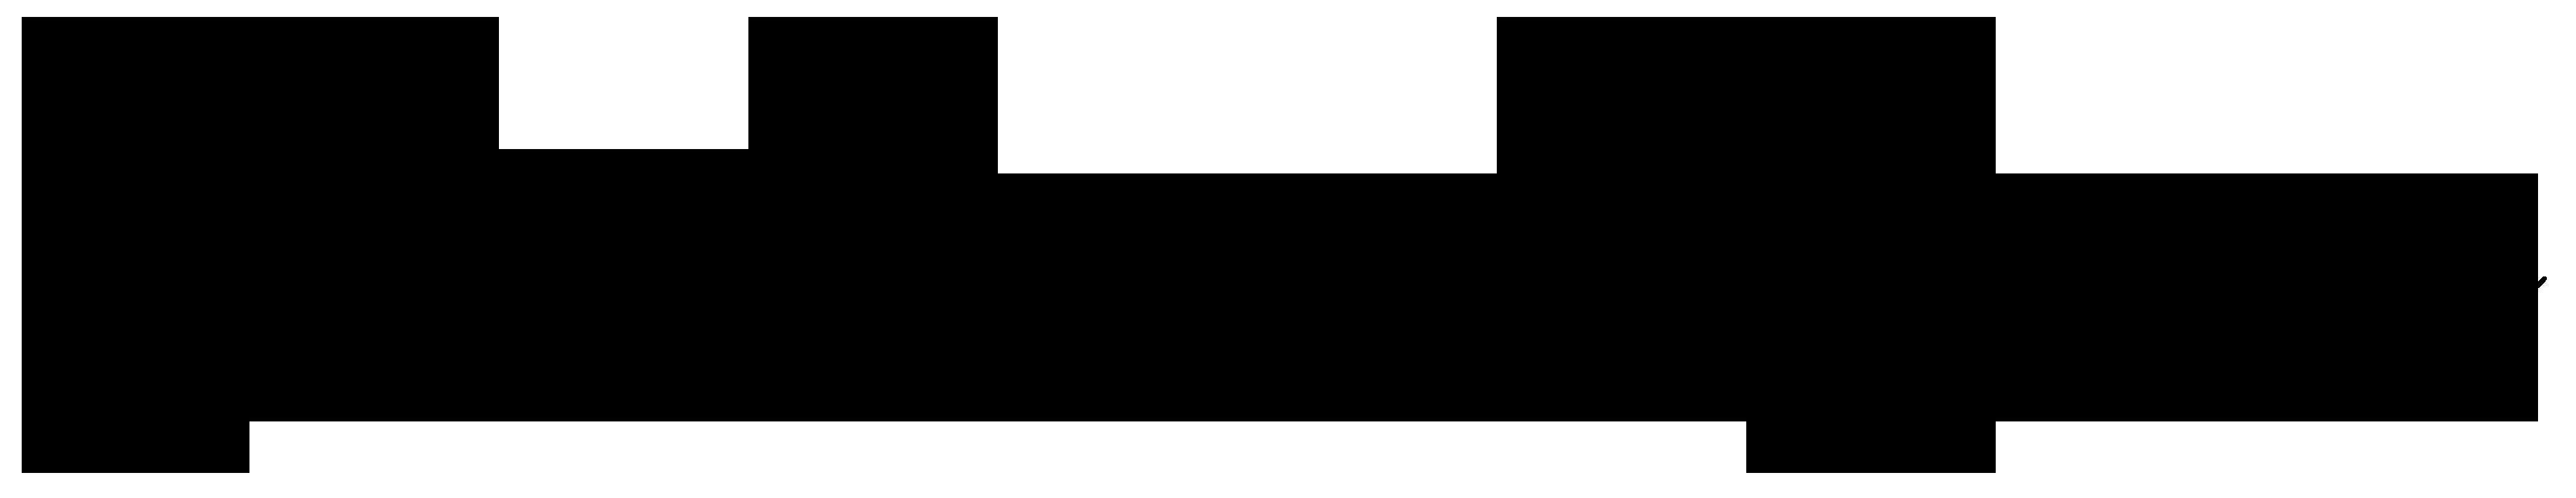 Suspense PNG - 58066